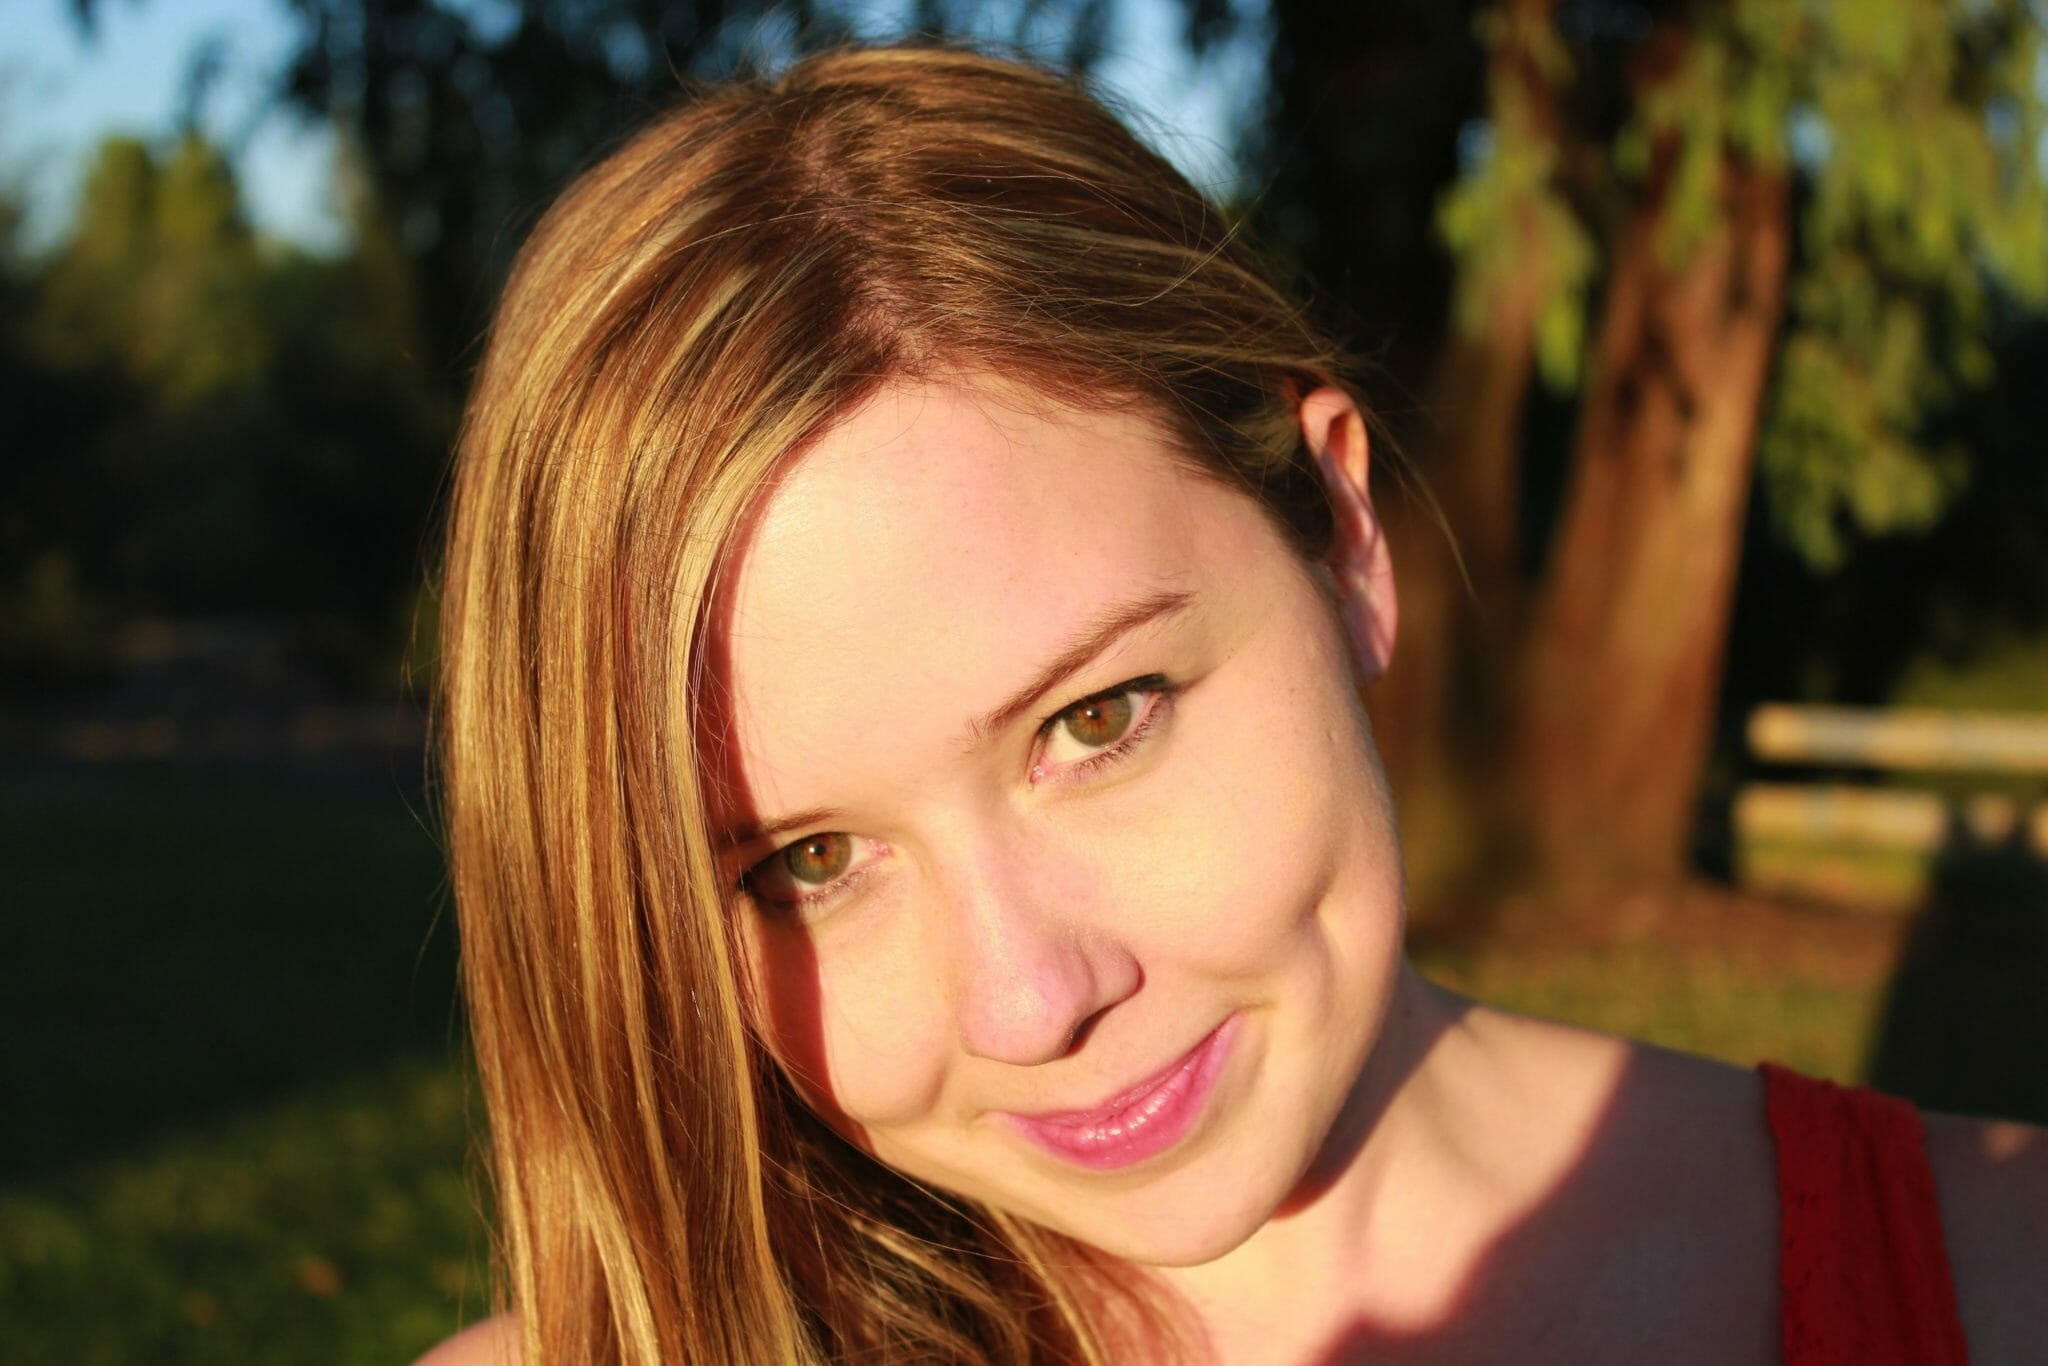 Nicole.Wensel.Photo self love beauty